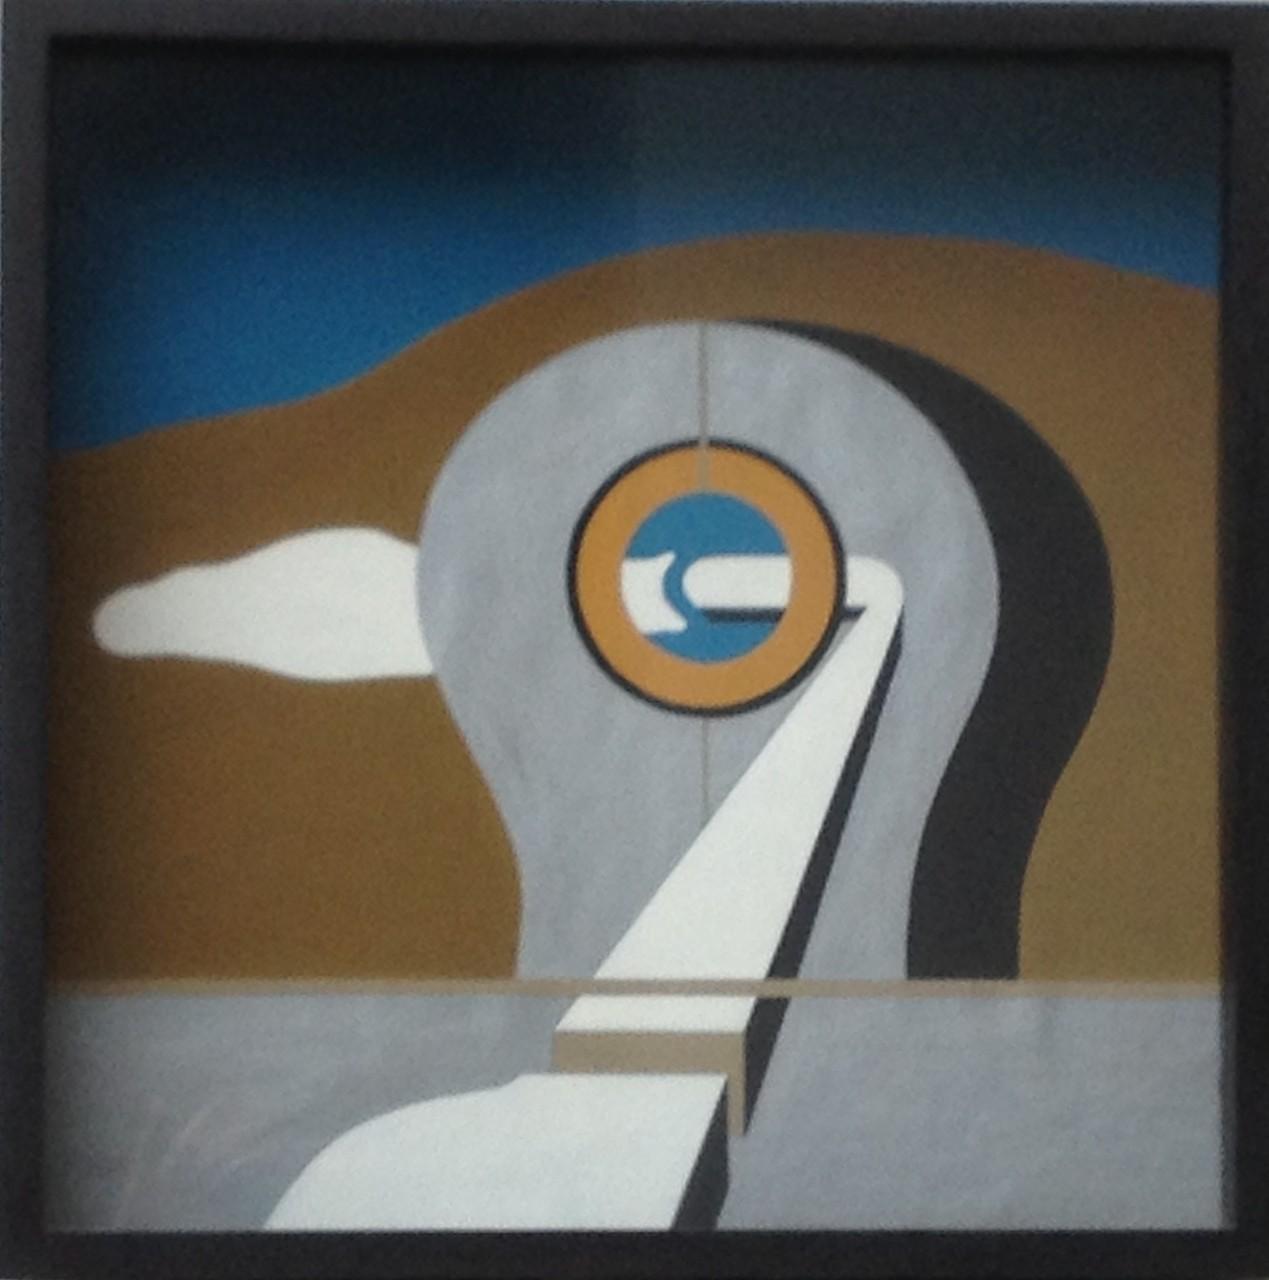 Fatamorgana, Gouache, 45 x 45 x 8 cm, 1973 (#598)